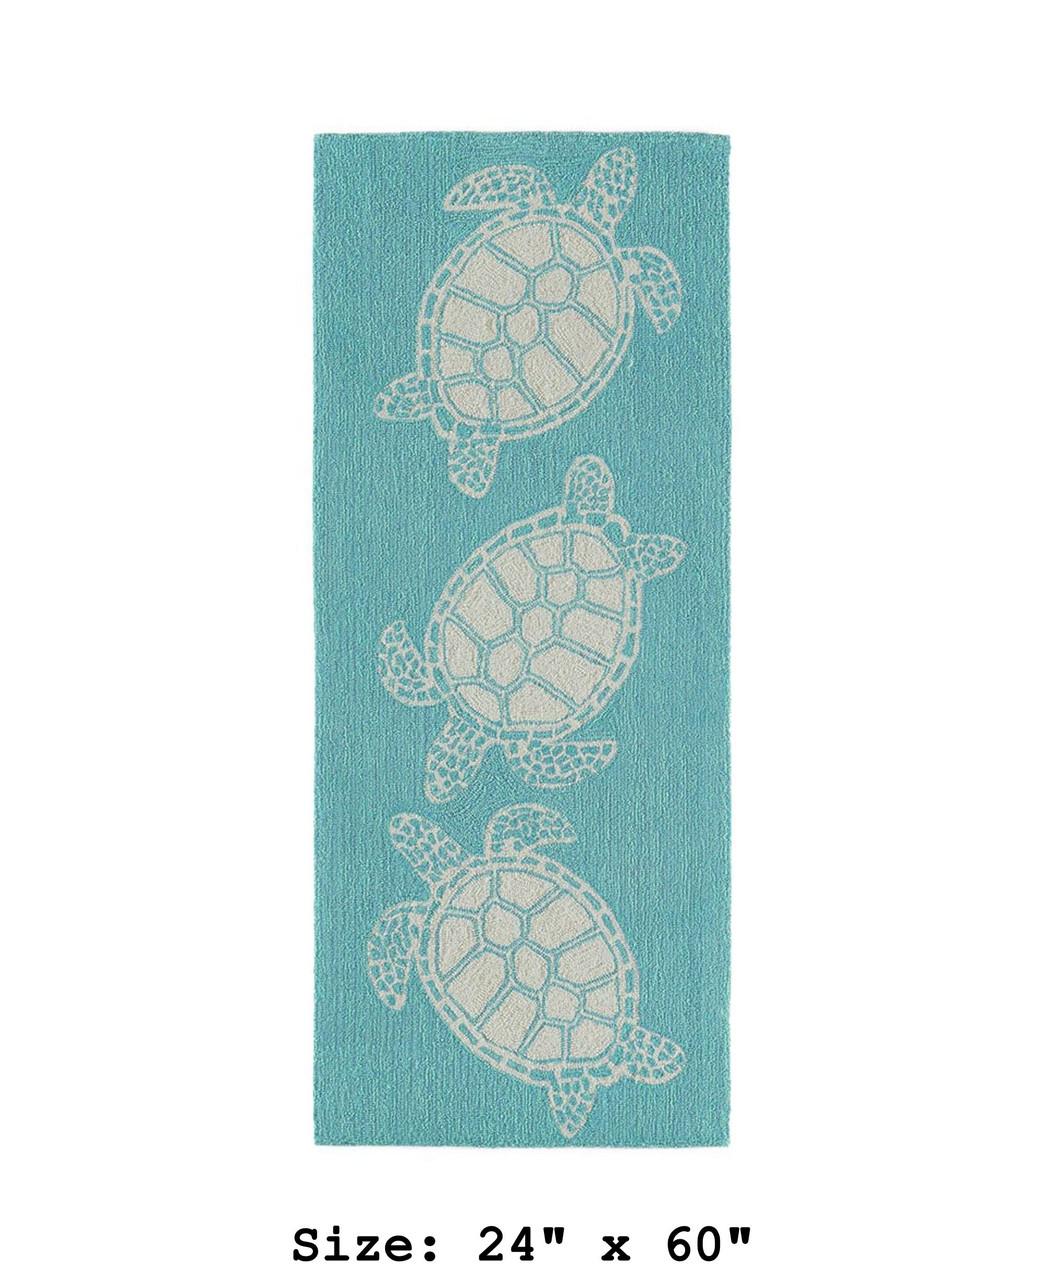 Capri Turtle Indoor/Outdoor Rug - Aqua - Small Runner Available in 6 Sizes